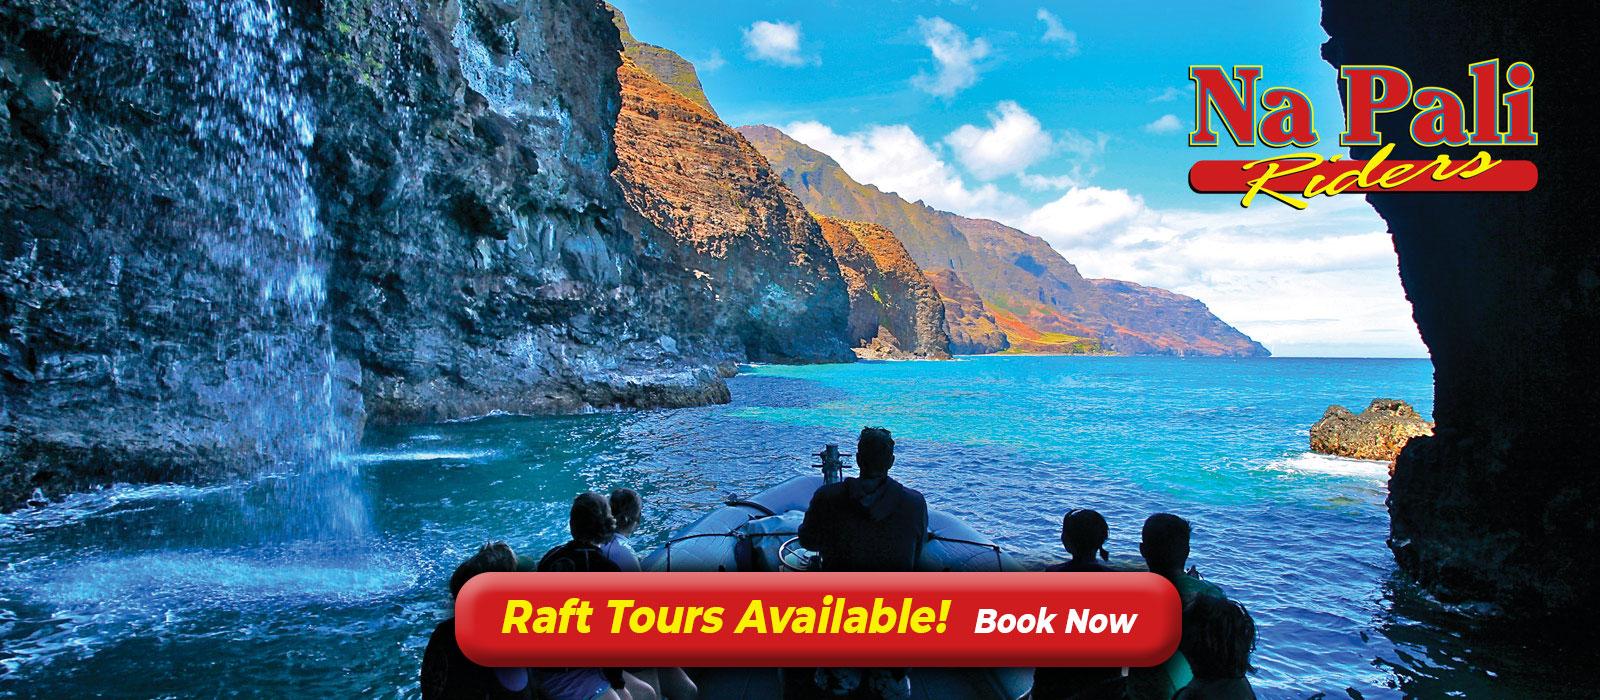 Na Pali Rider Raft Tours